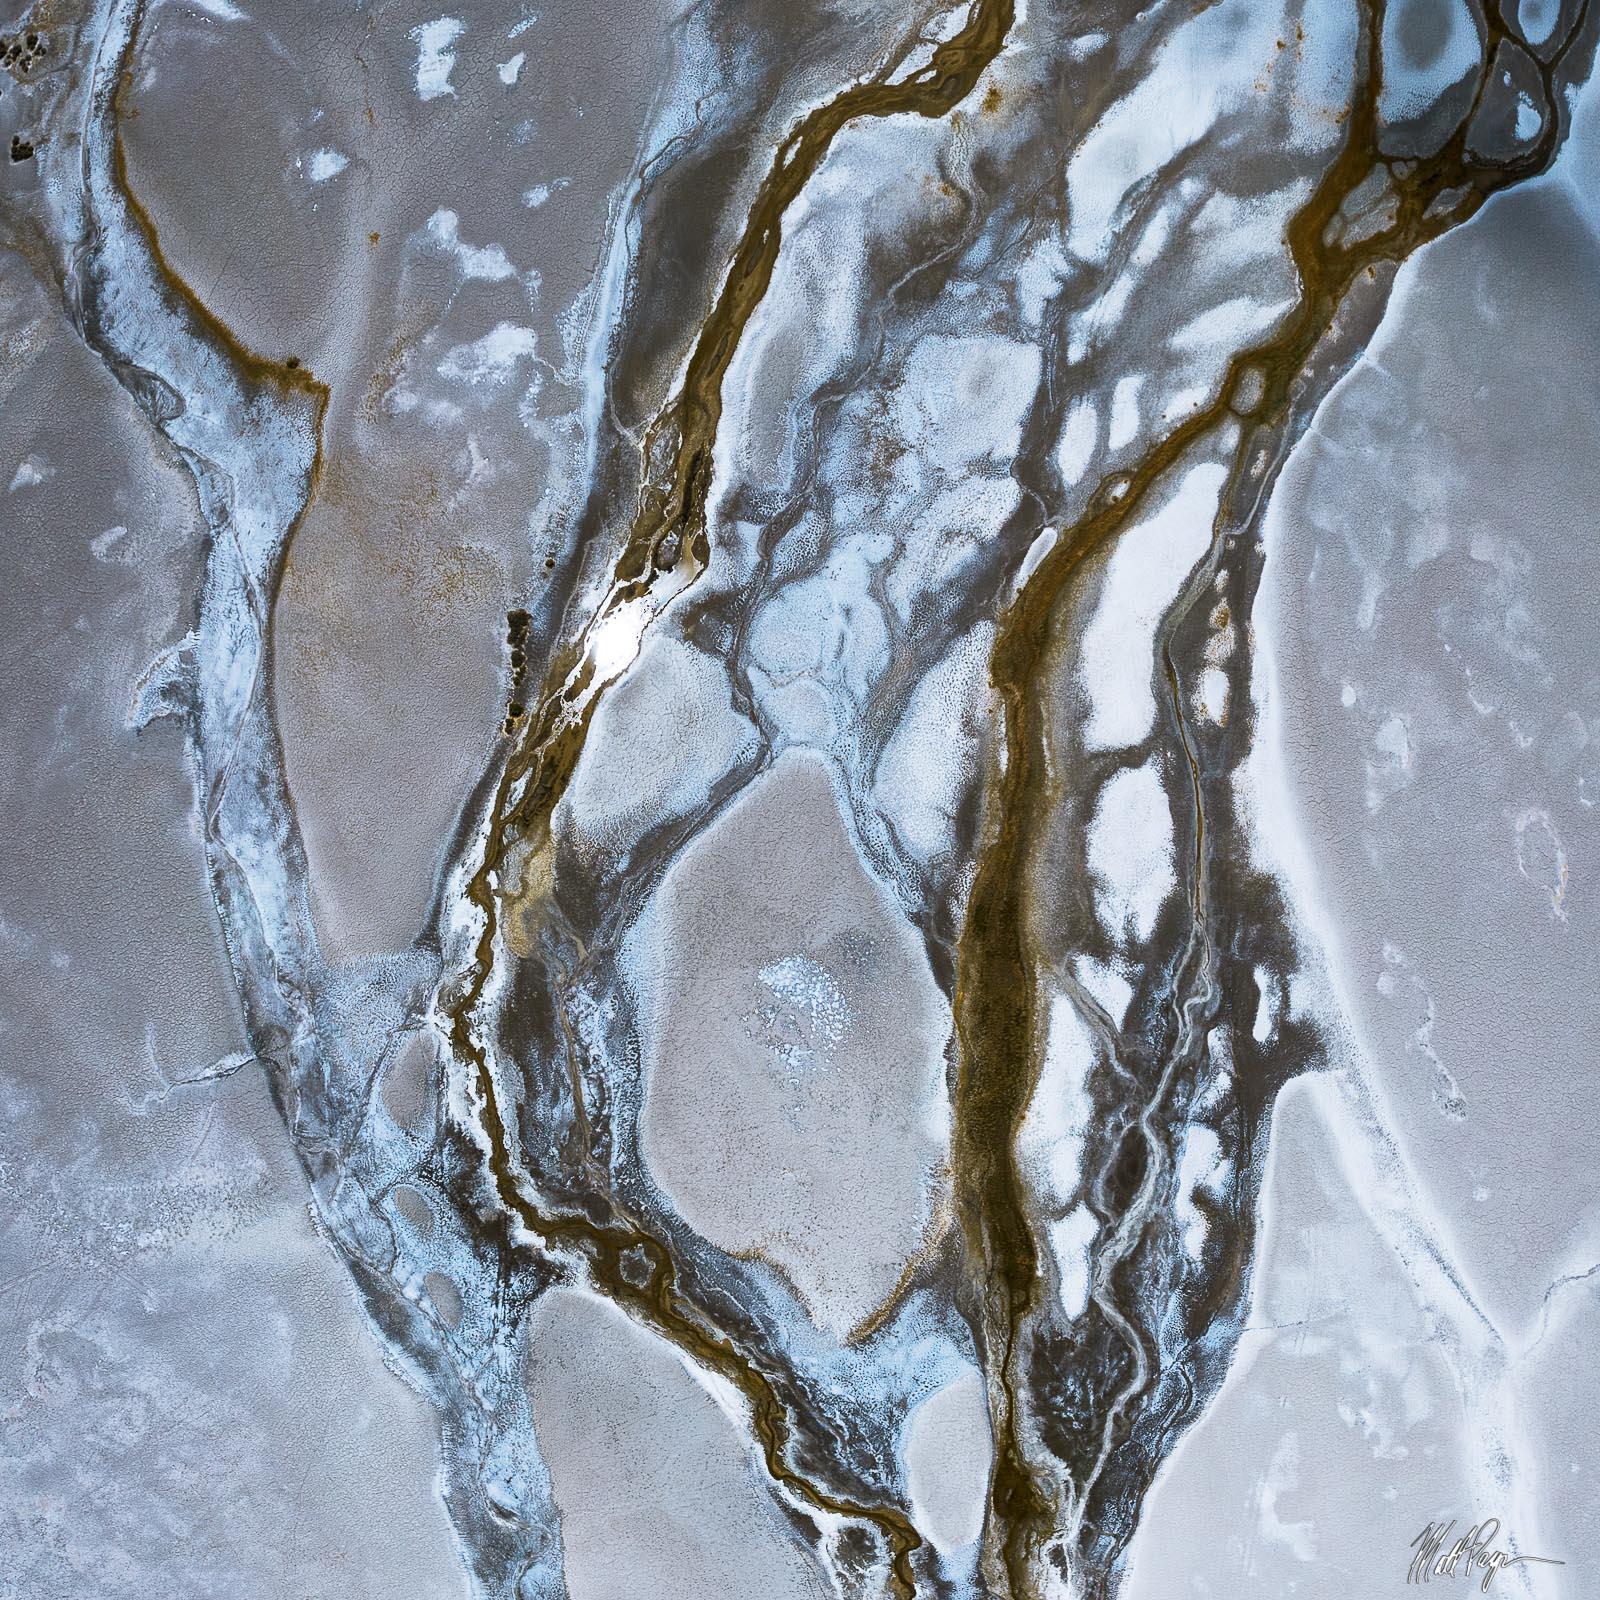 Tributaries of water flow through the Oregon Desert. Photo © copyright by Matt Payne.